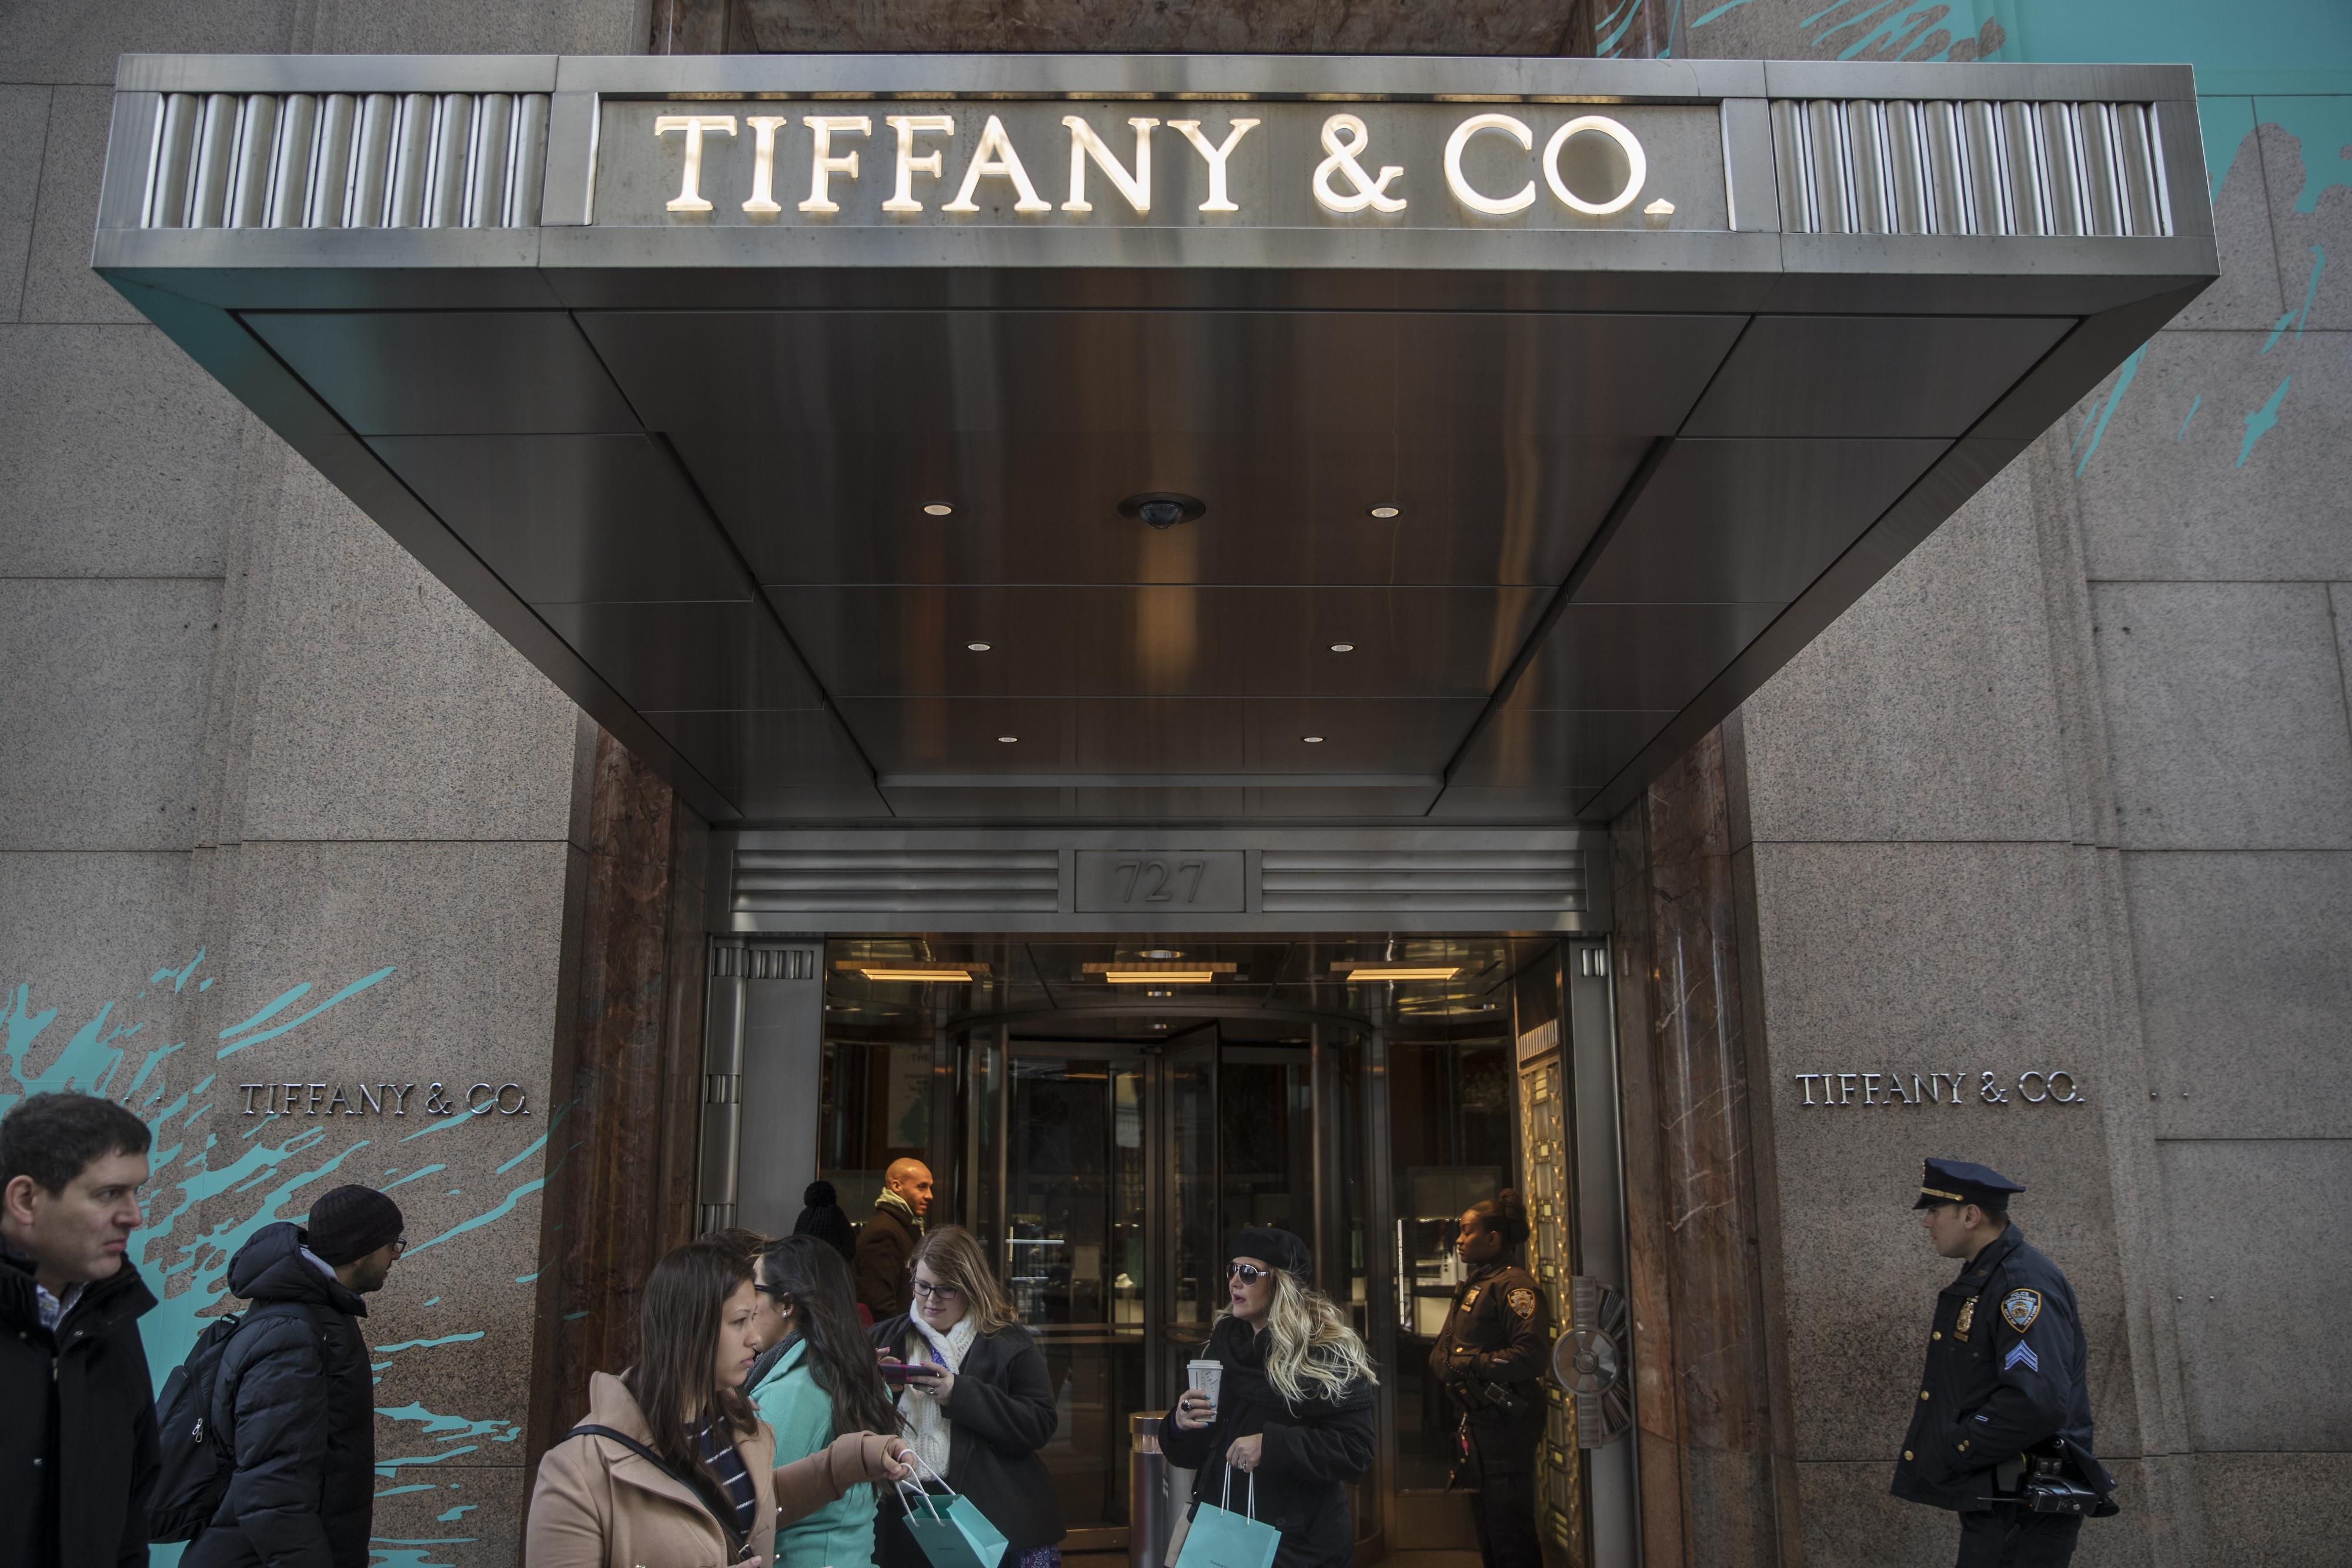 5ef86d94bd508 Store Ahead Of Earnings Figures A Tiffany & Co. Store Ahead Of Earnings  Figures